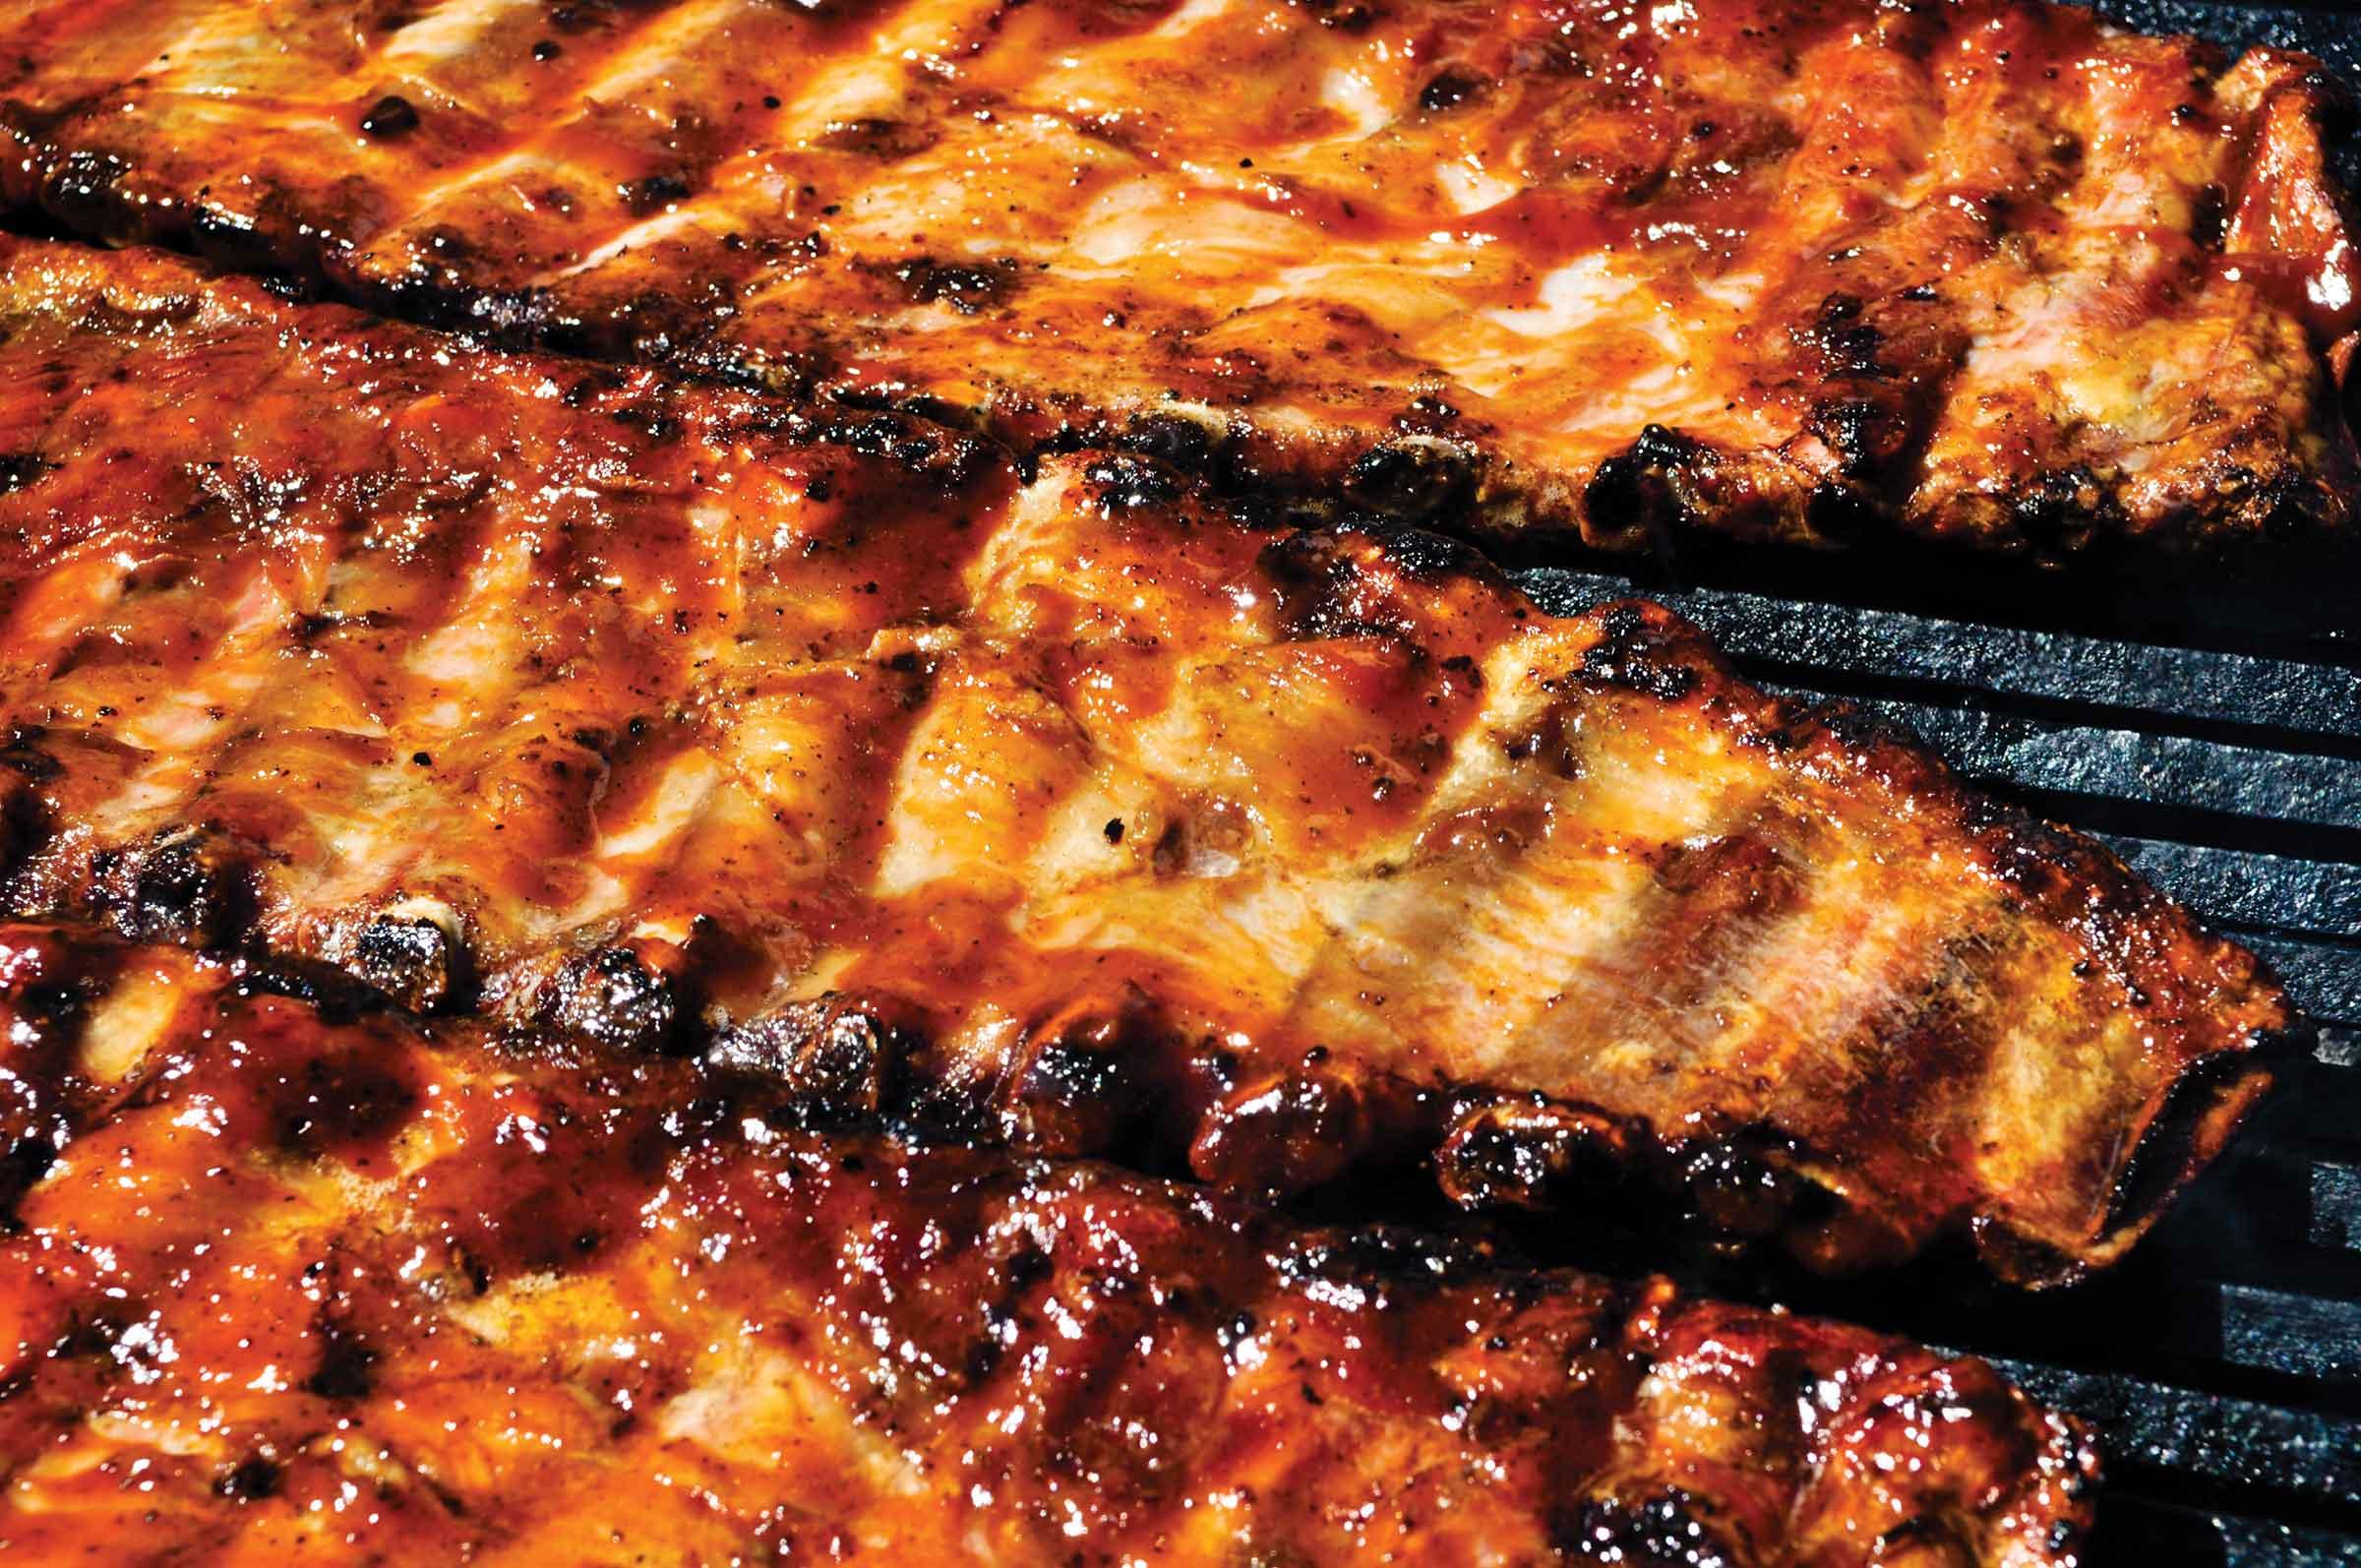 Ribs-on-grill_ShutStock60567958.jpg